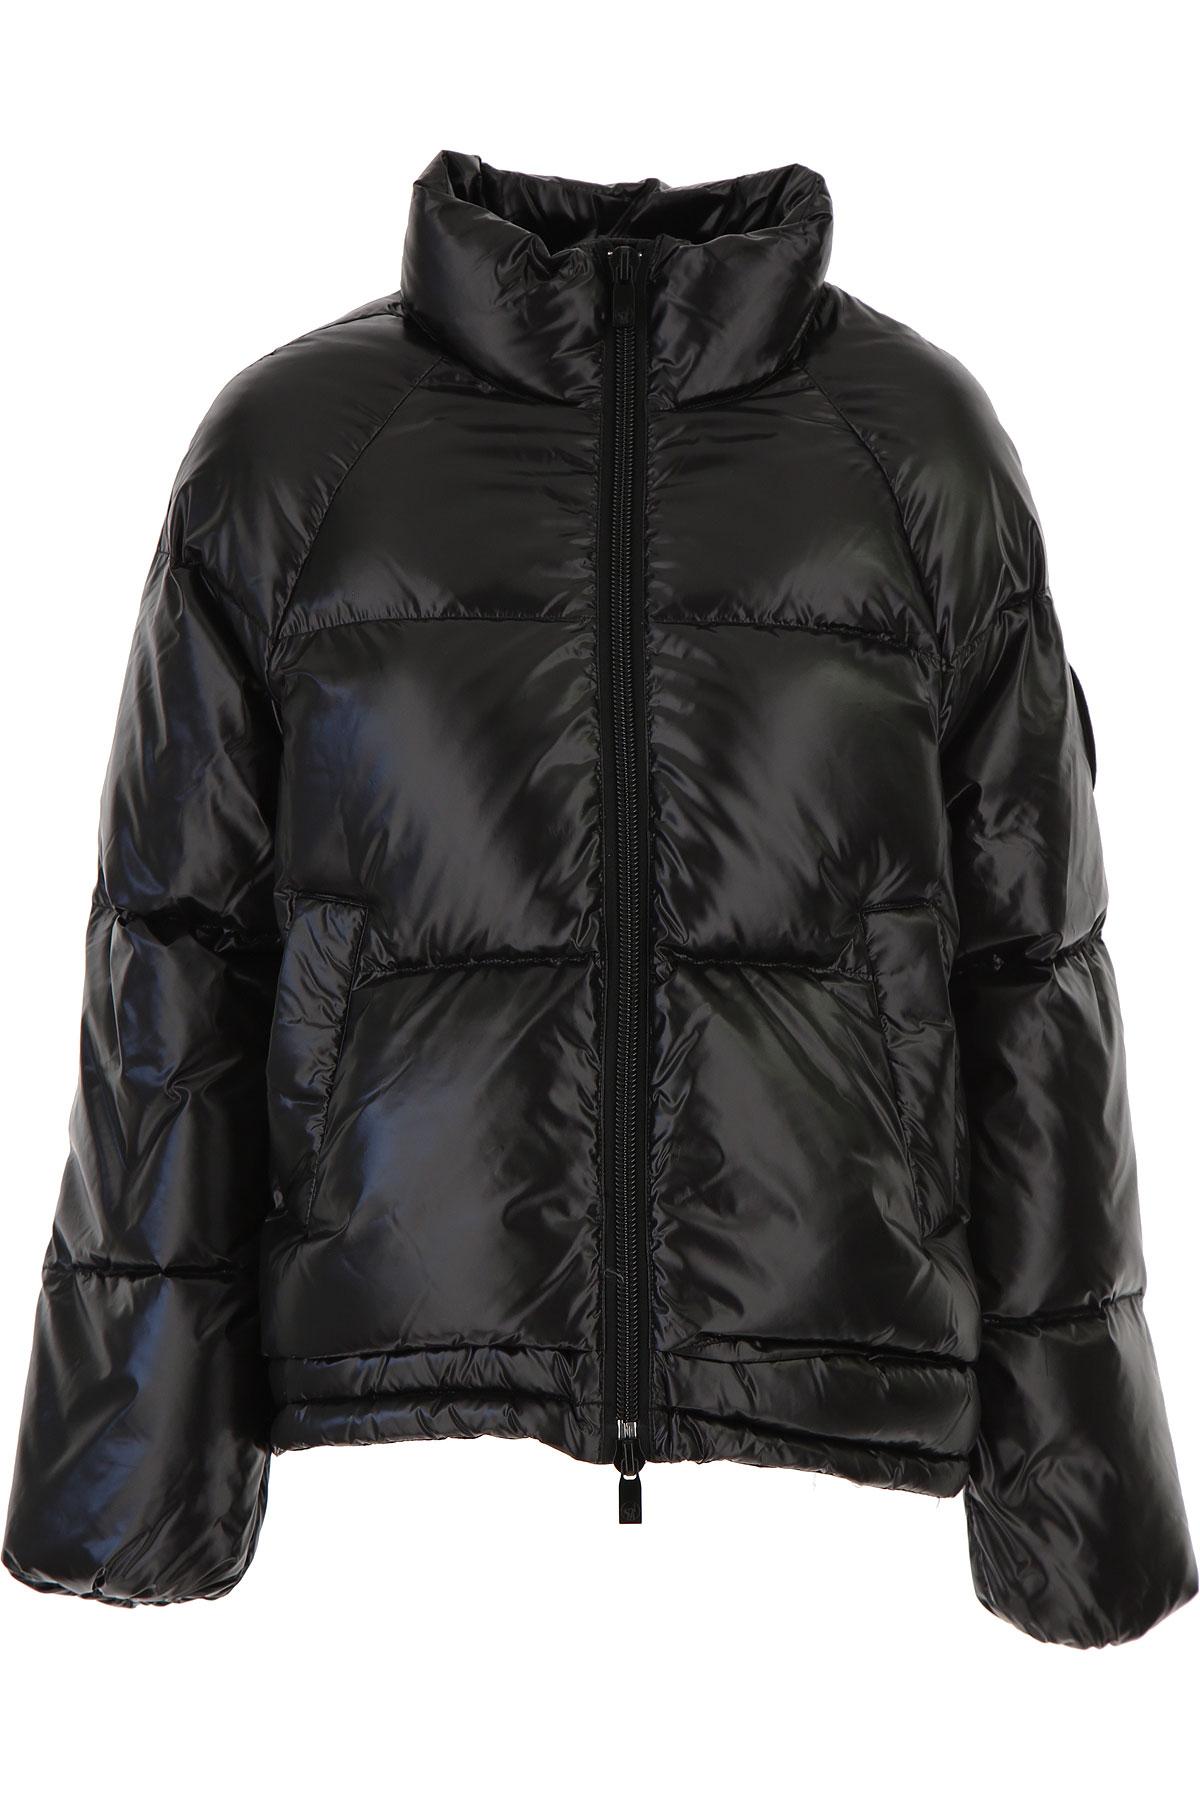 Ciesse Piumini Down Jacket for Women, Puffer Ski Jacket On Sale, Black, Nylon, 2019, 4 6 8